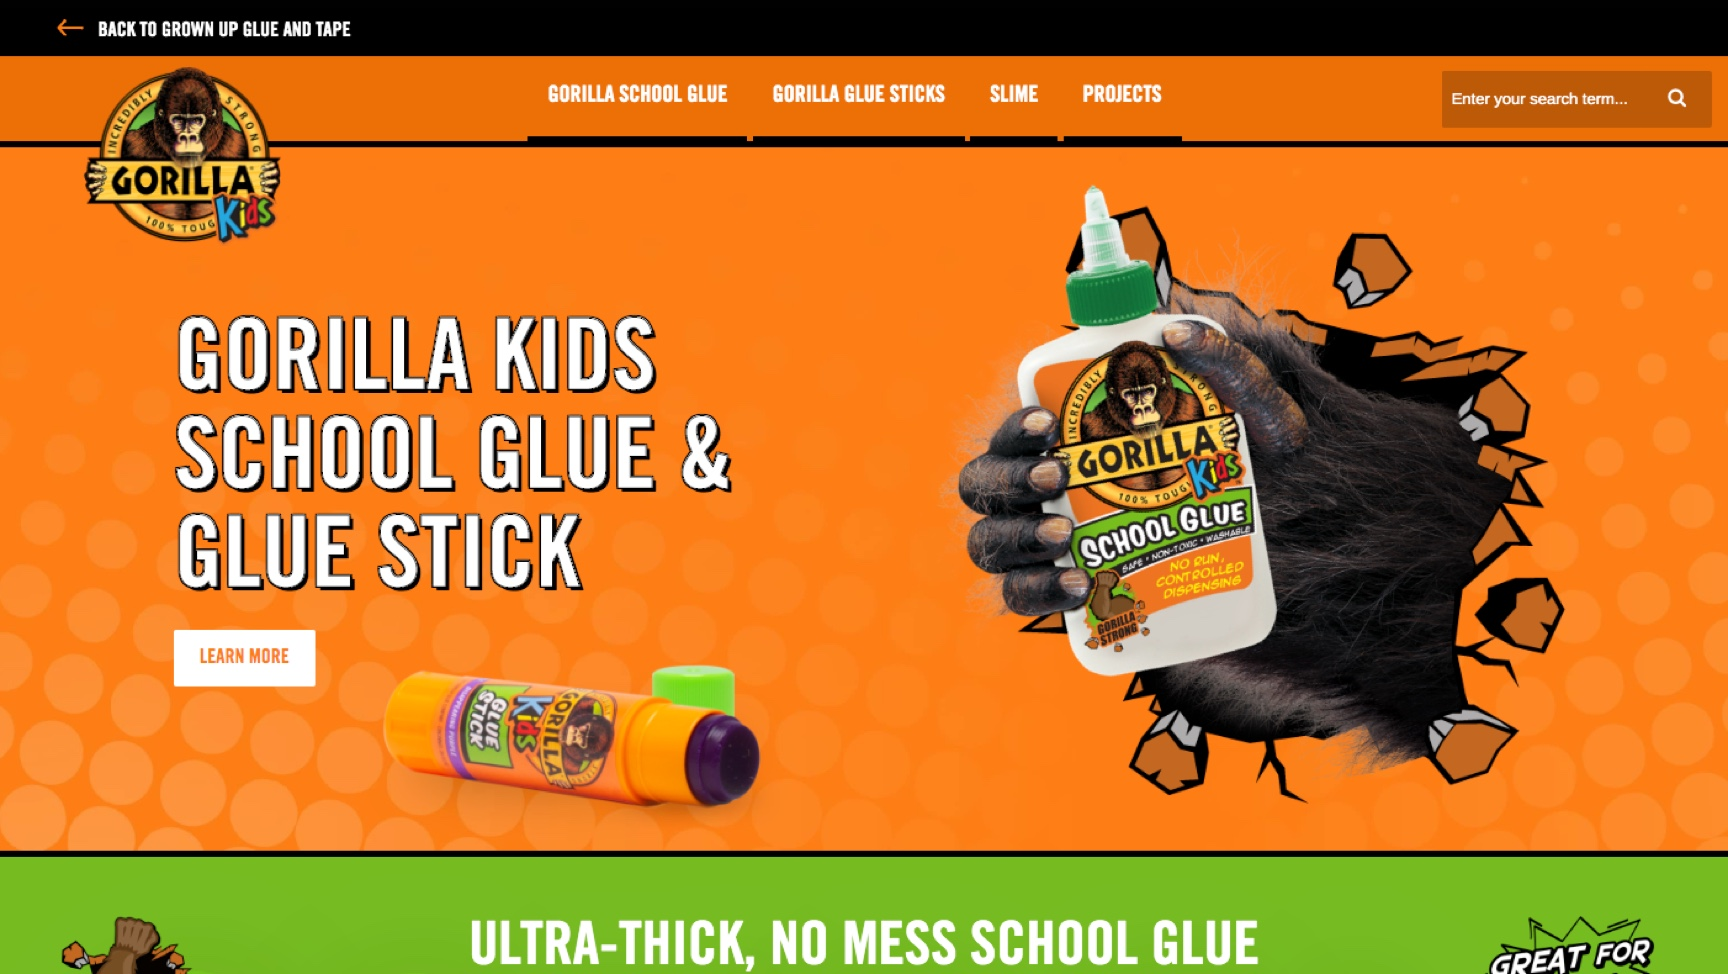 Image of Gorilla Glue Kids webpage.